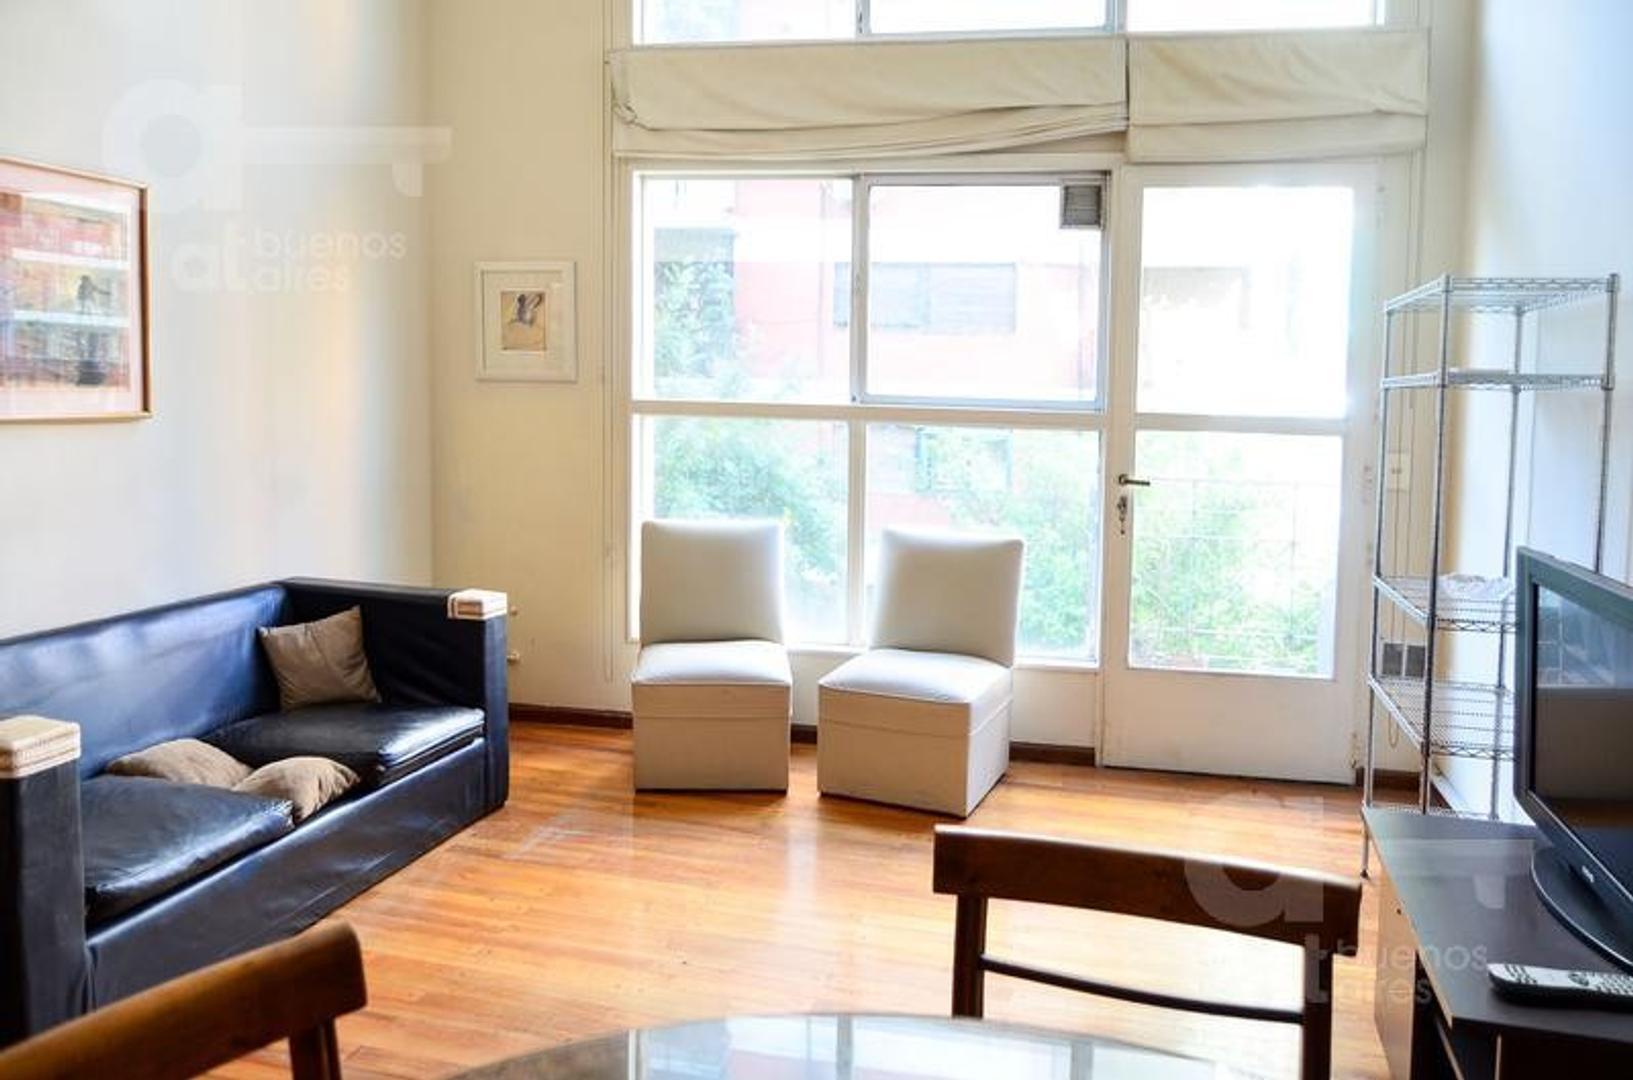 Palermo. Duplex 2 ambientes con balcón. Alquiler temporario sin garantías.